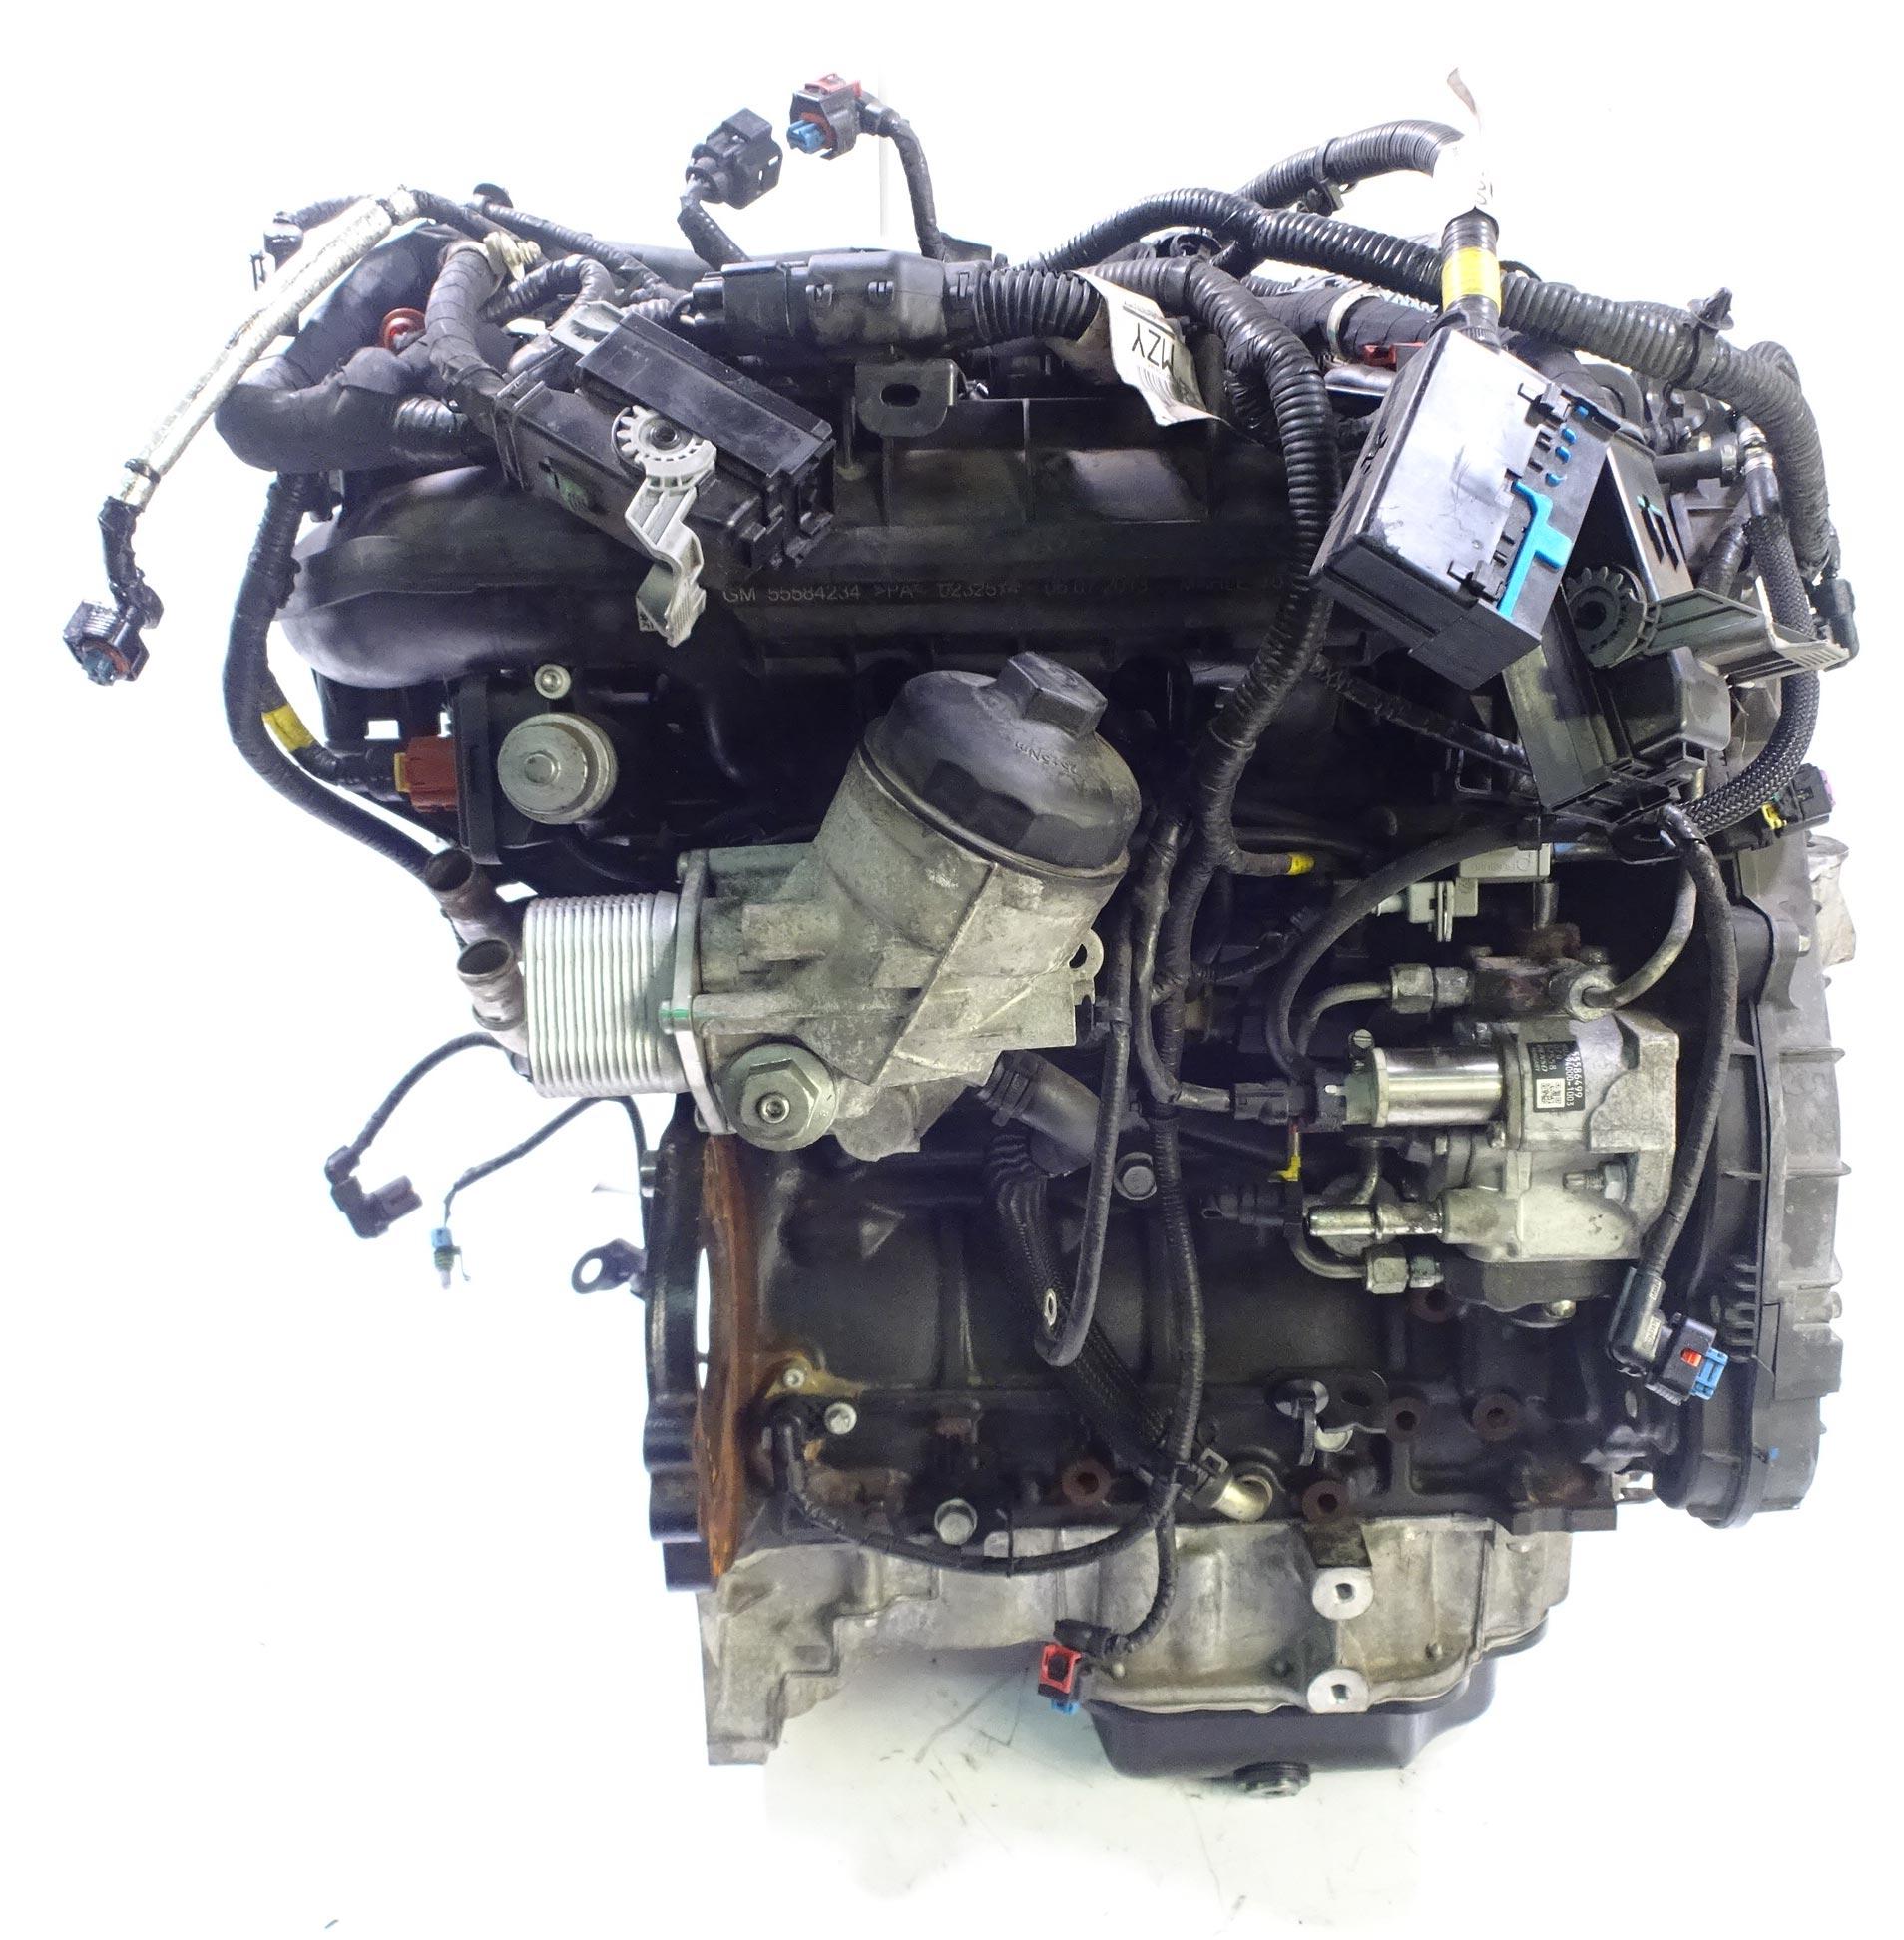 Motor 2014 Opel Astra GTC J Corsa Meriva Mokka 1,7 CDTI A17DTS mit Anbauteilen